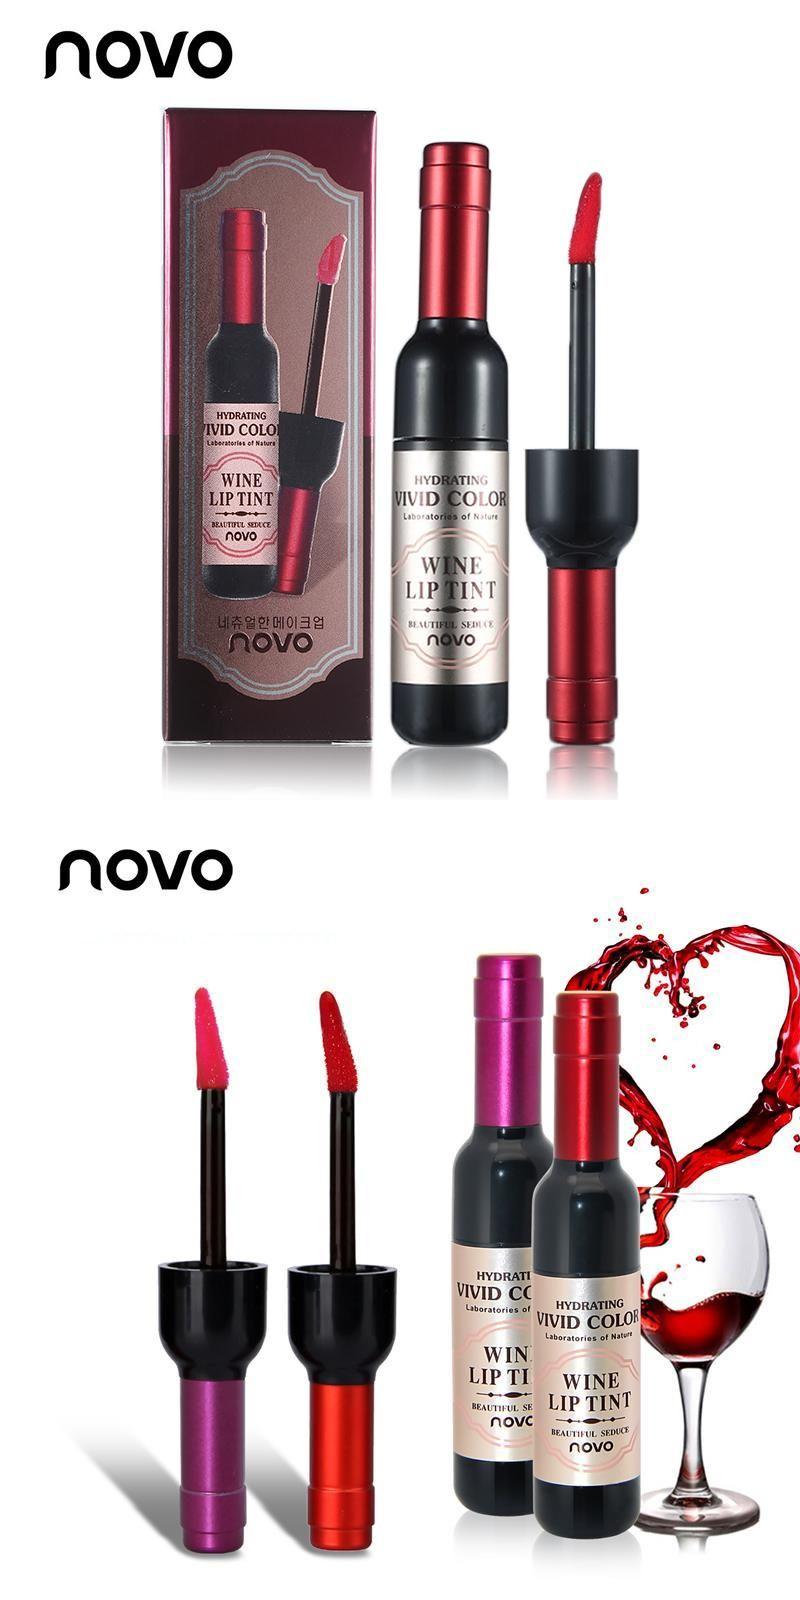 [Visit to Buy] NOVO Brand Lip Makeup Red Wine Lip Tint